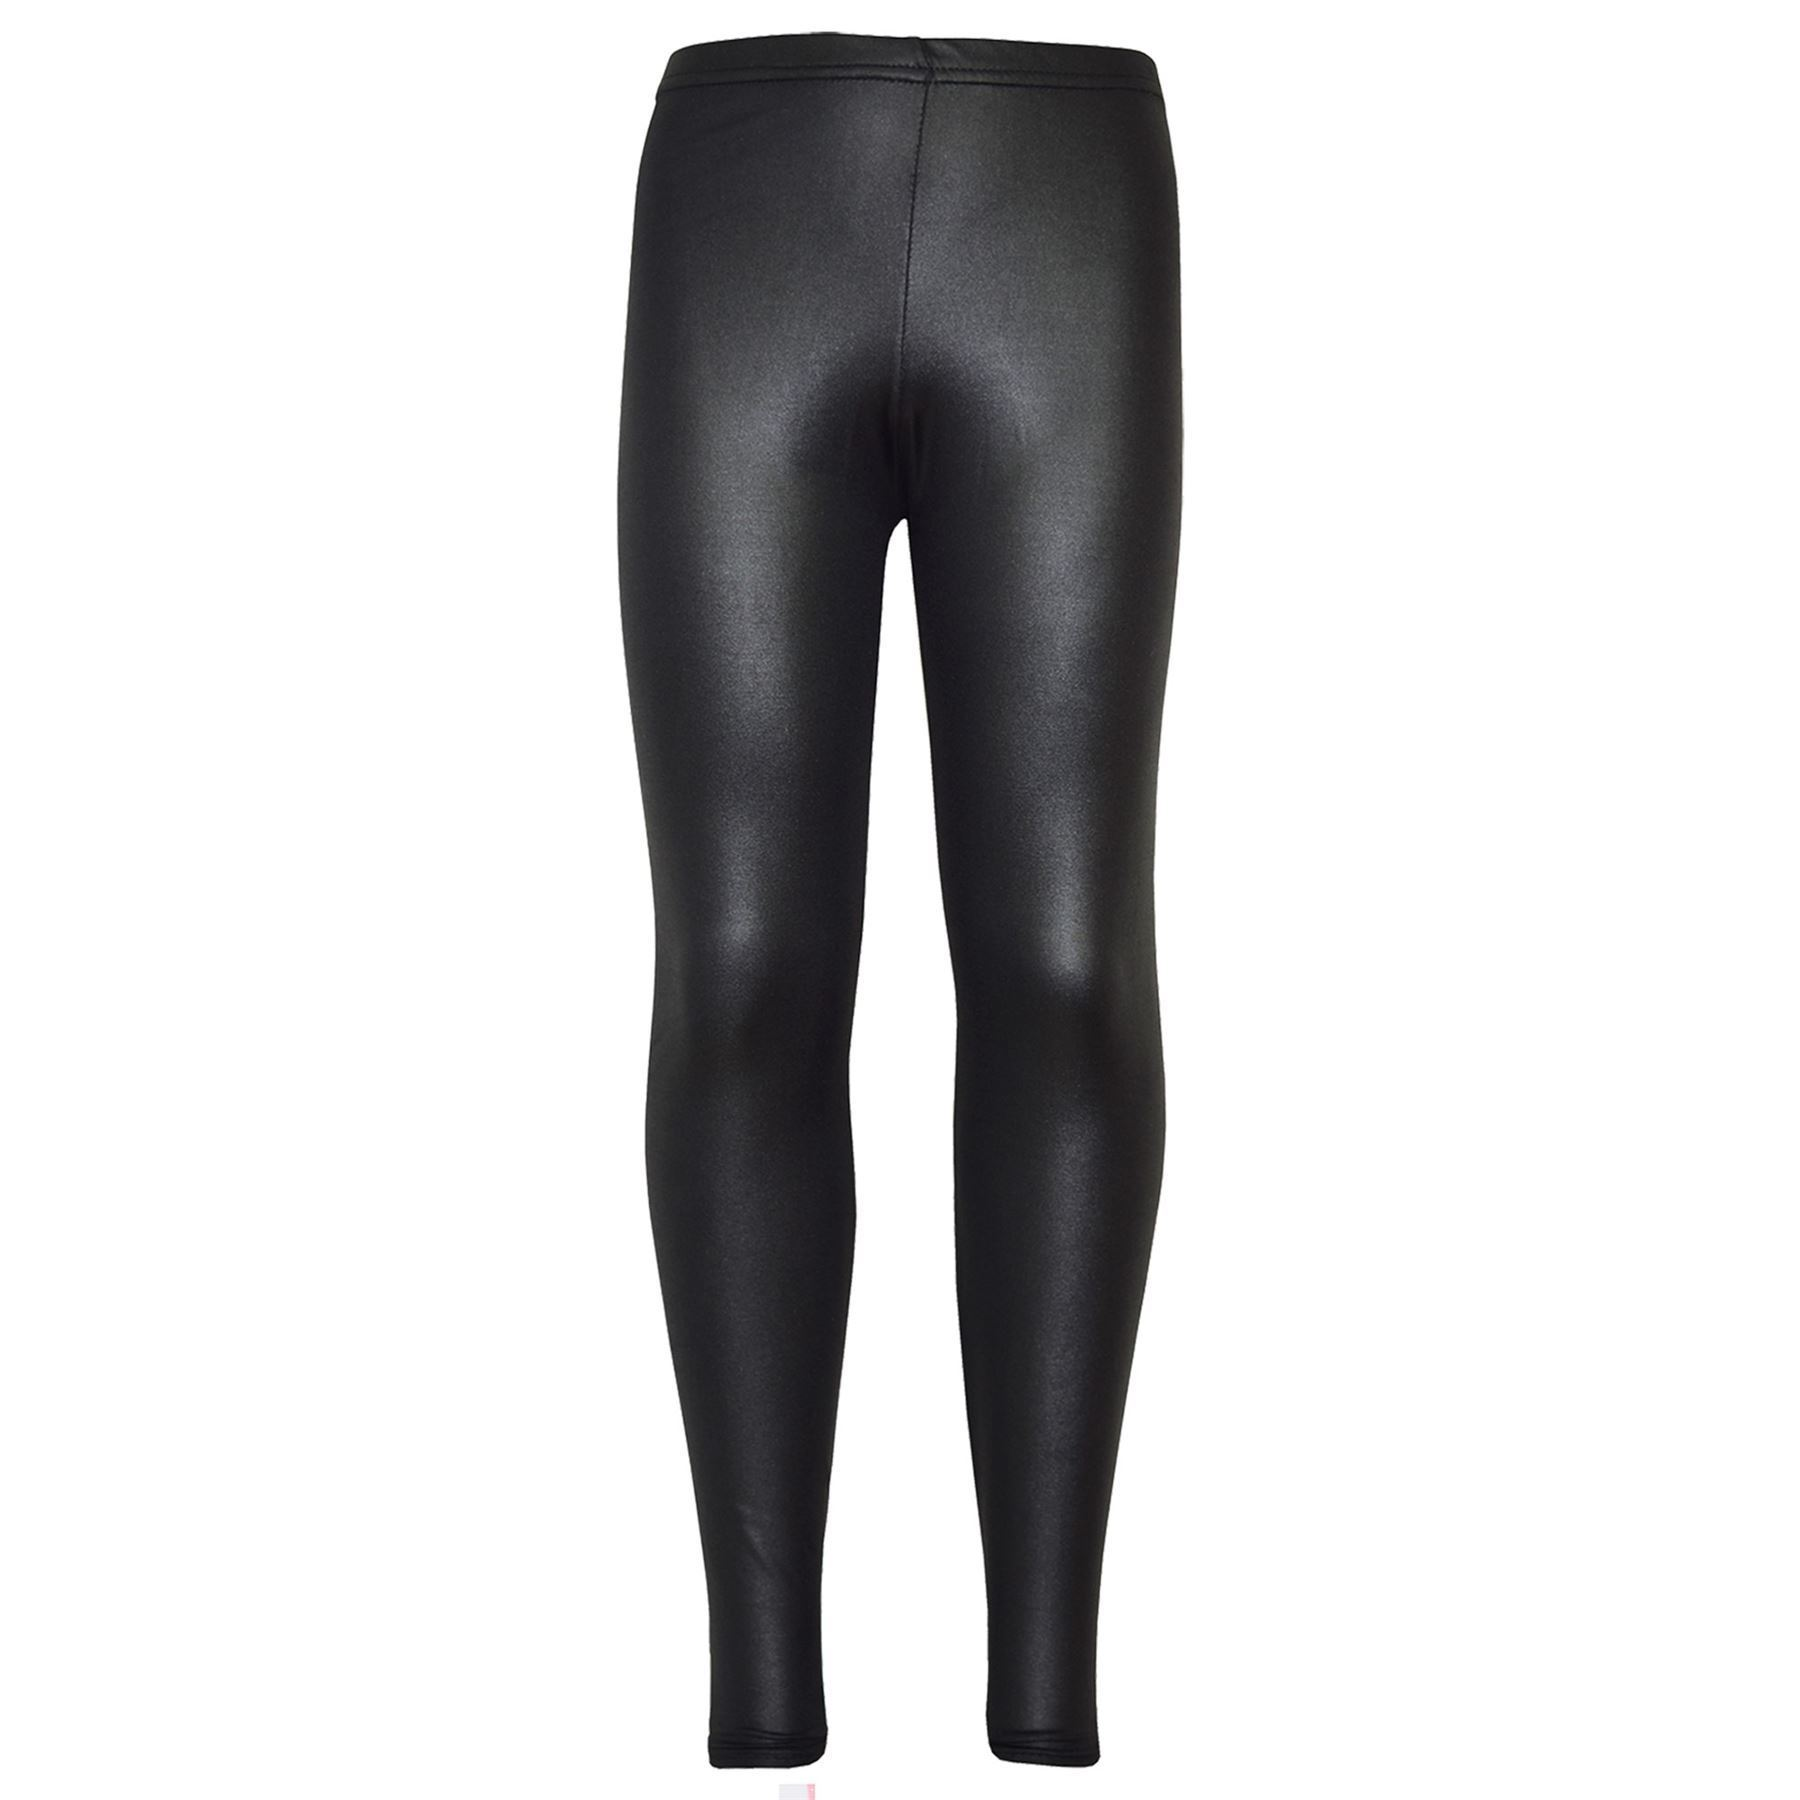 Girls Top Kids Designer/'s Just Get Over It T Shirt /& Fashion Legging Set 7-13 Yr